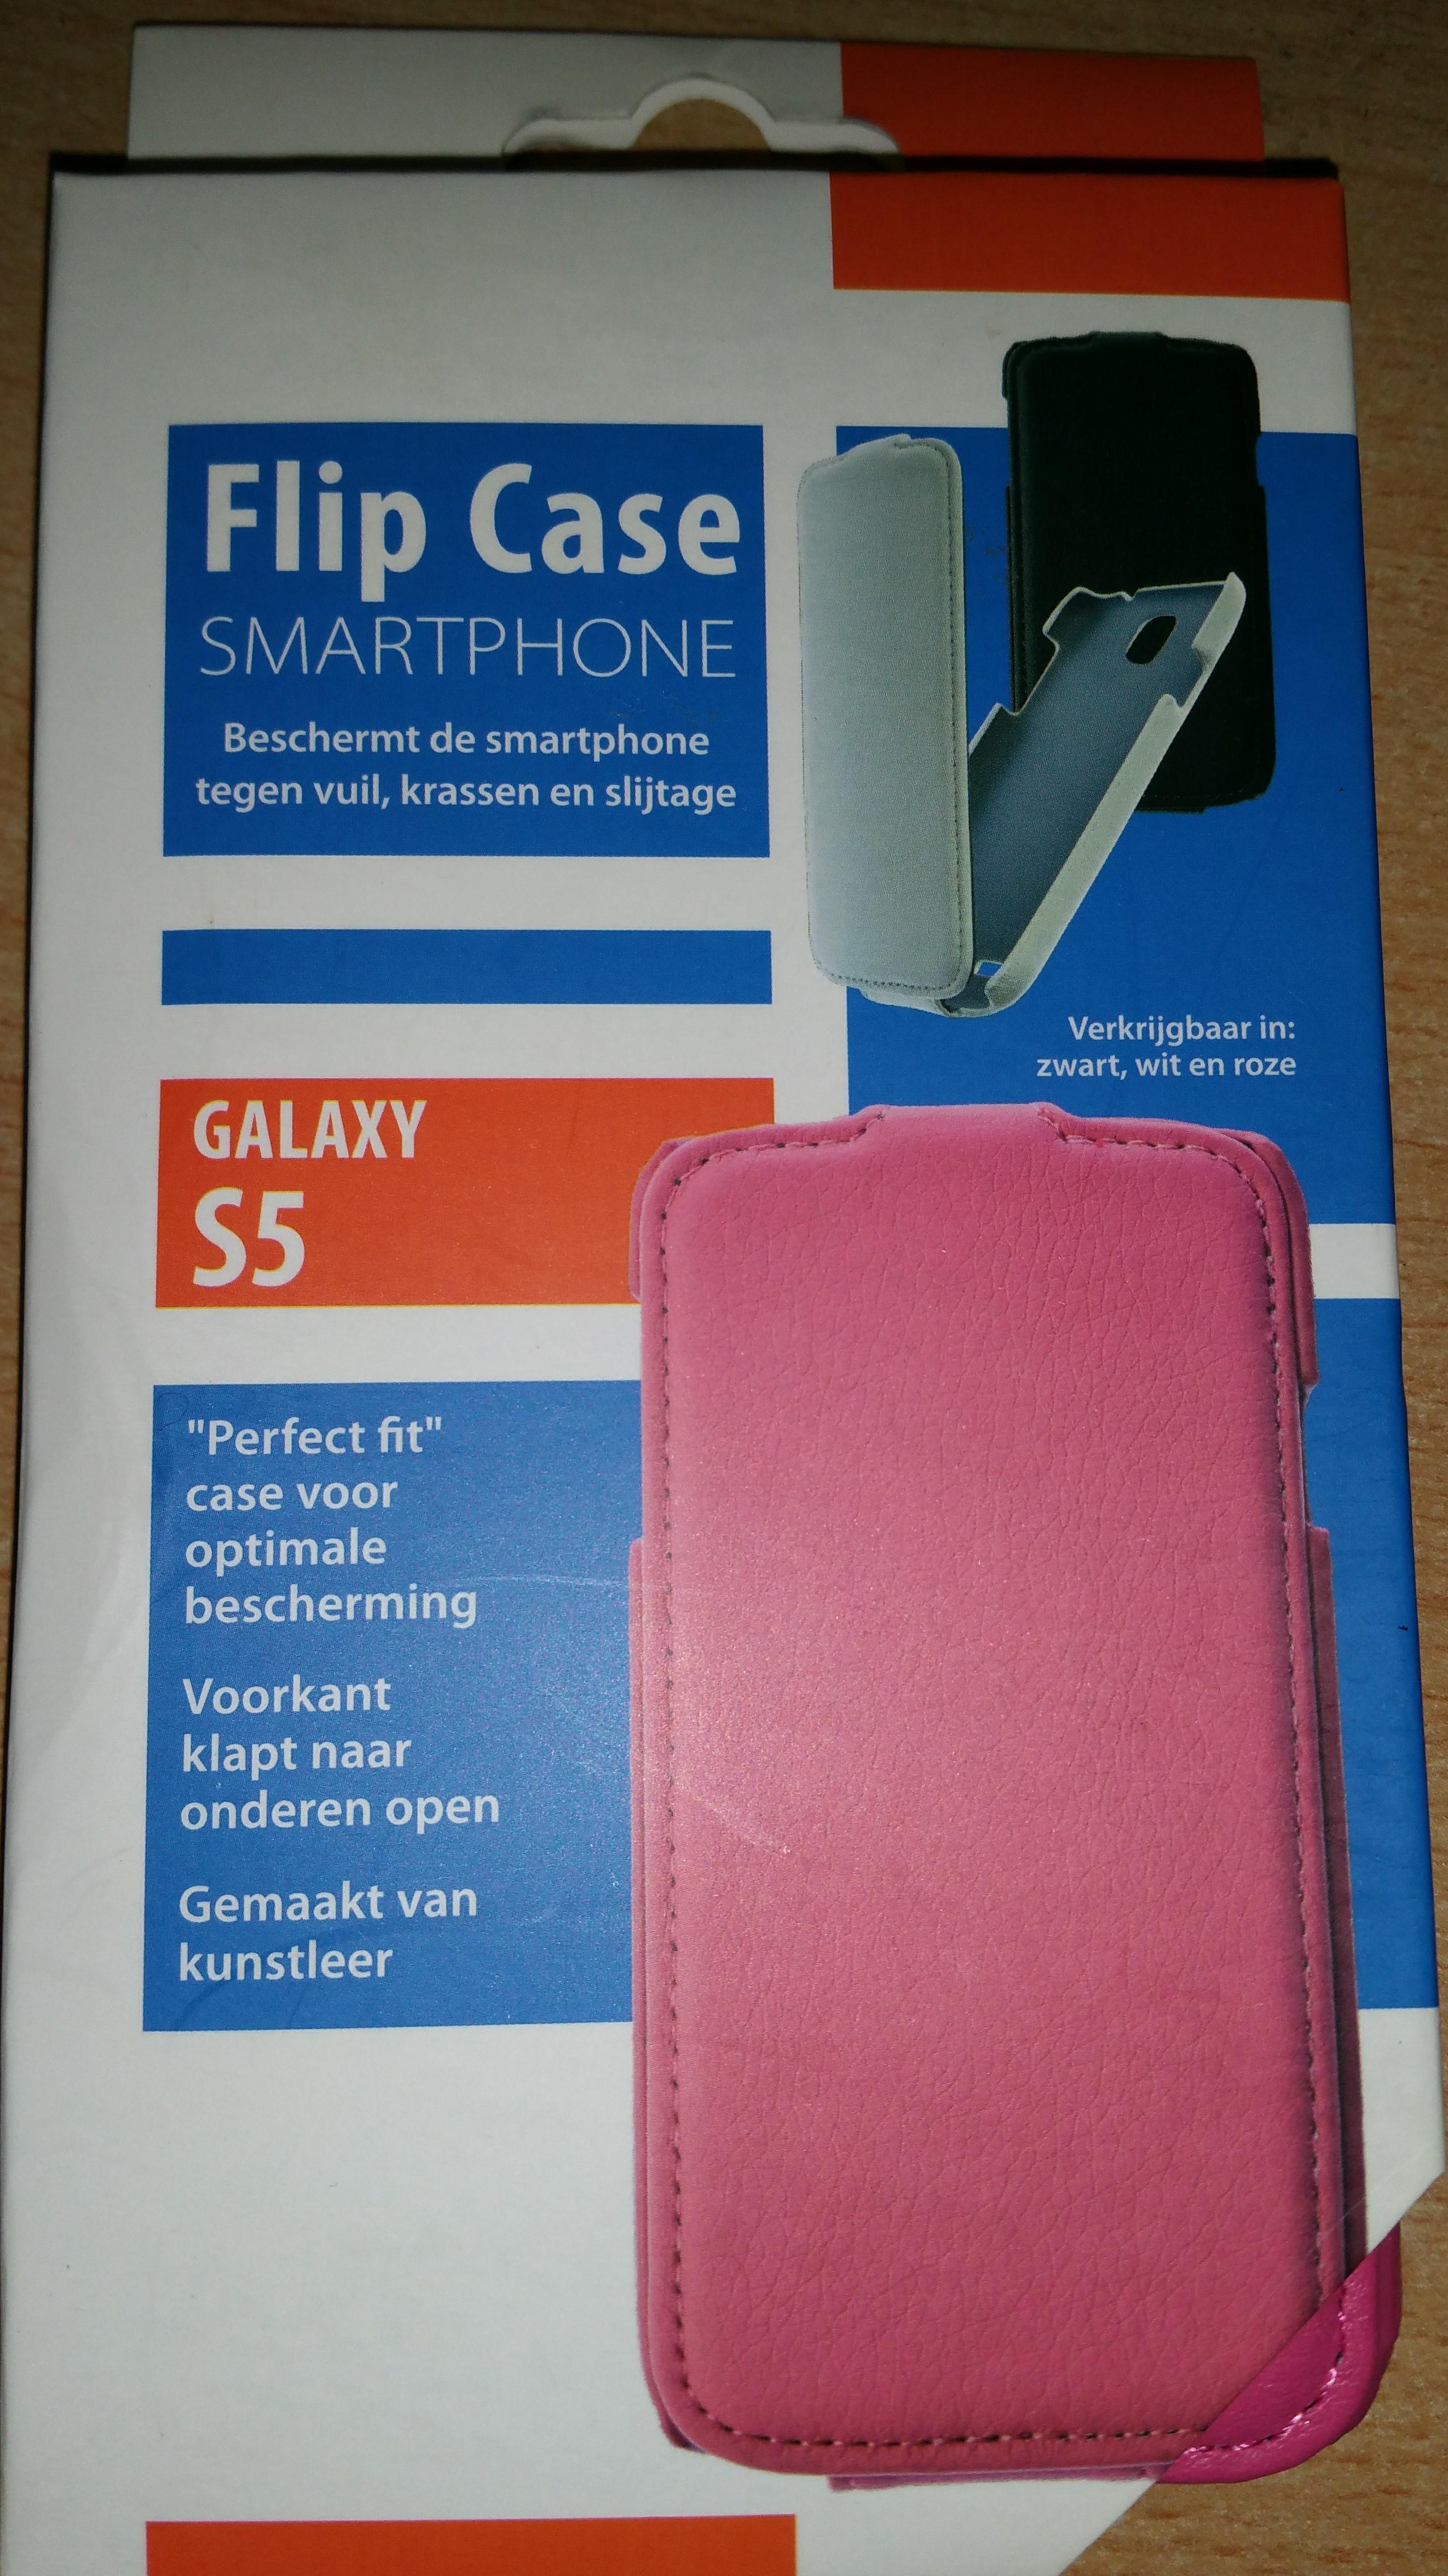 Telefoonhoes Galaxy S5 flip case